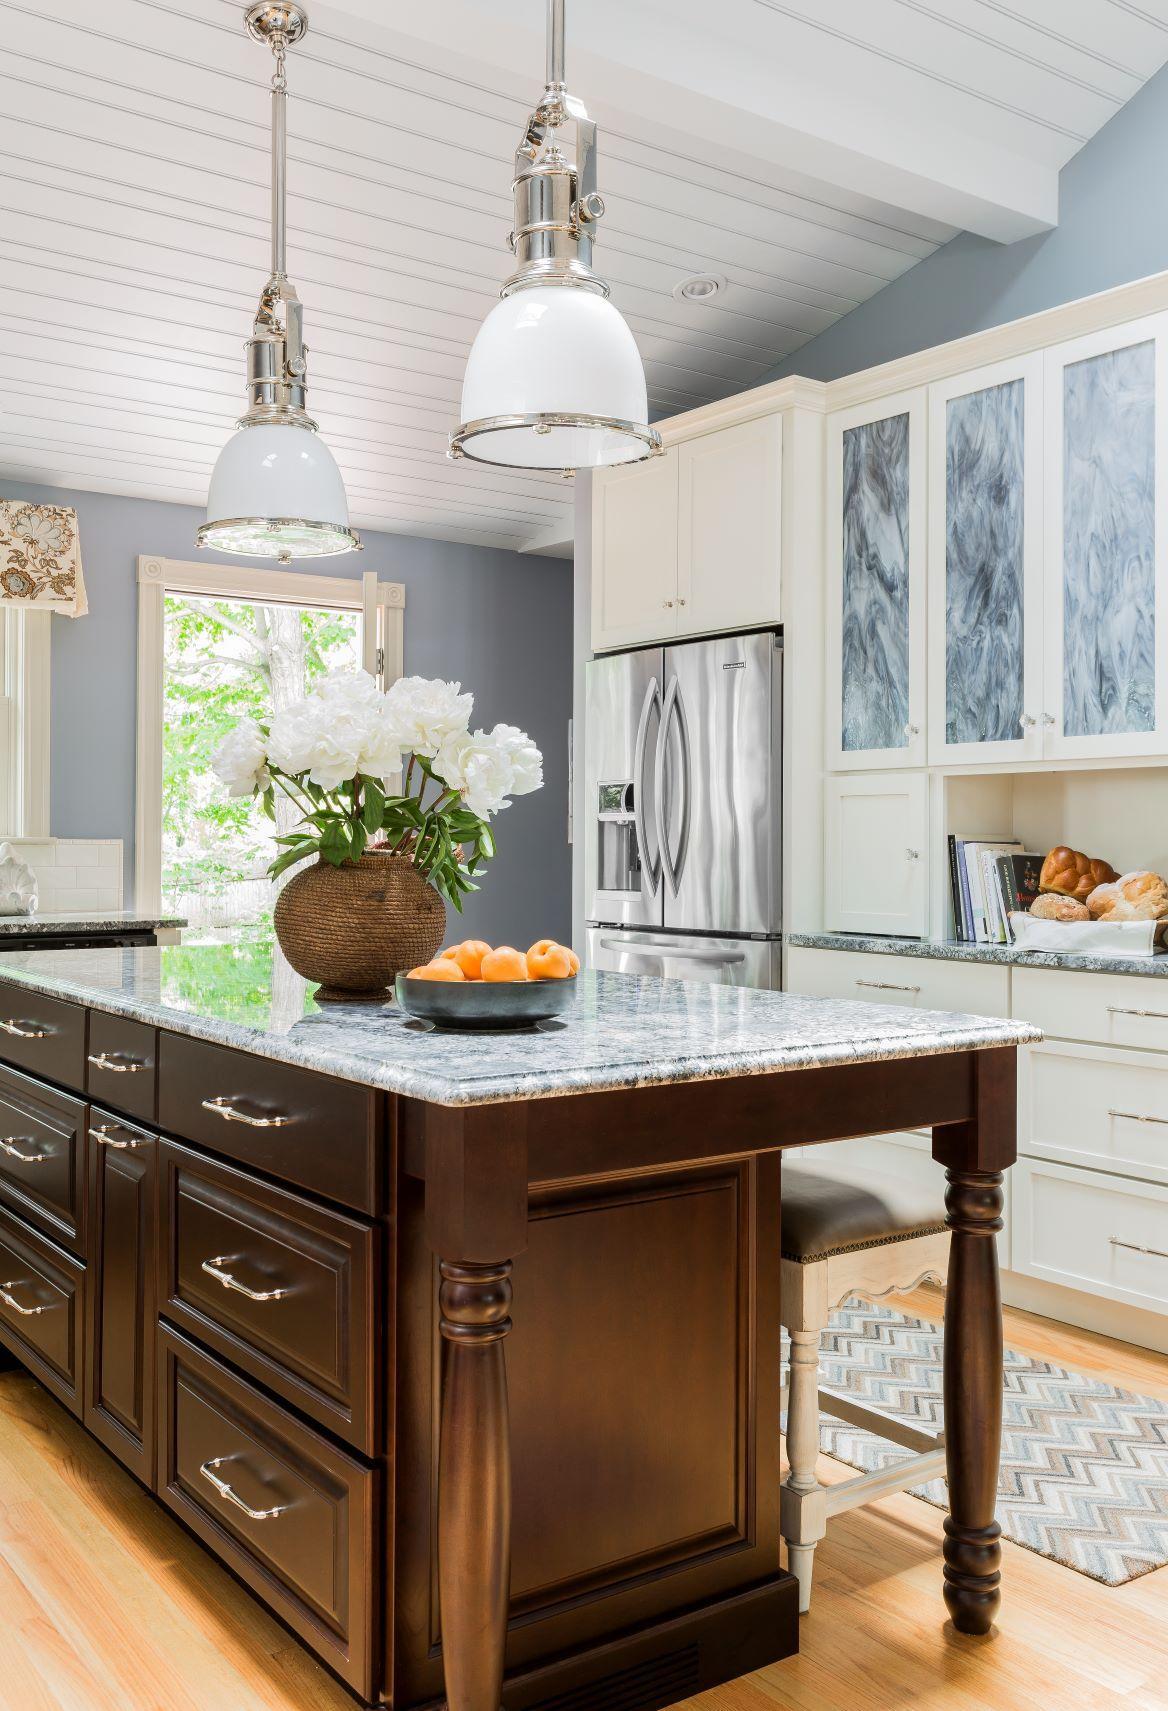 Traditional Style Kitchen Design Cabinet Door Styles Beautiful Kitchen Designs